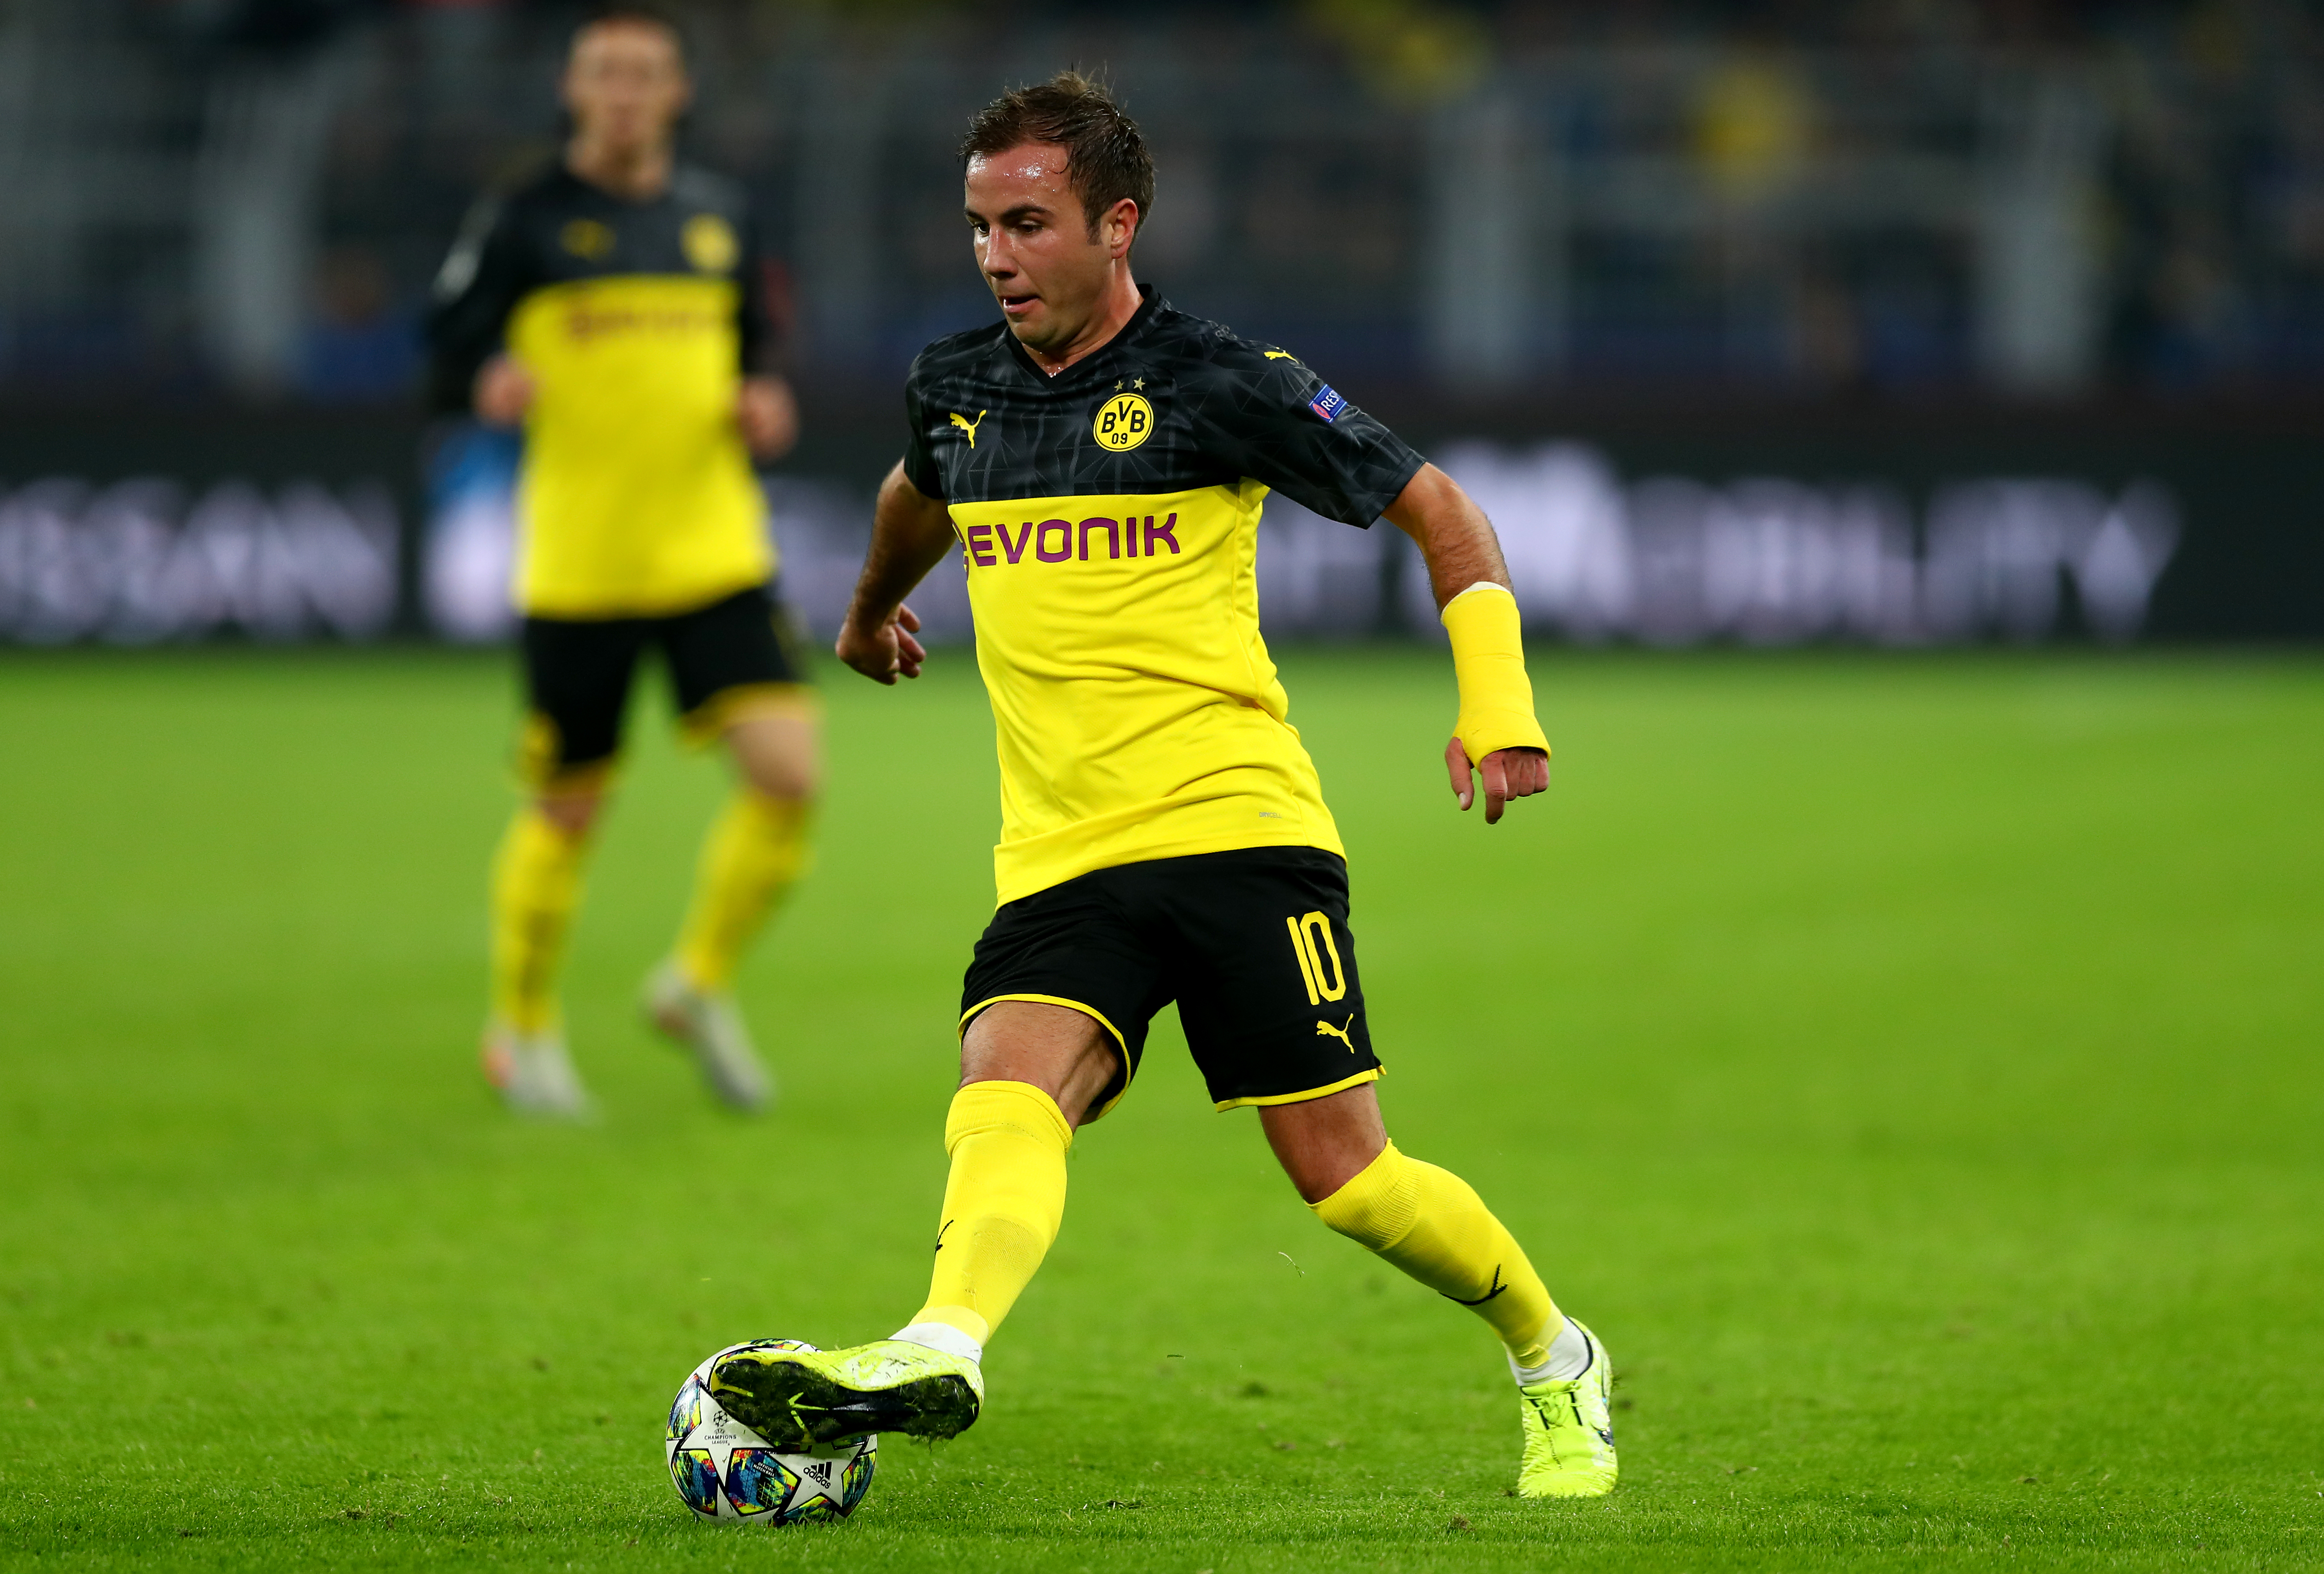 Fussball Heute Fc Barcelona Borussia Dortmund Im Live